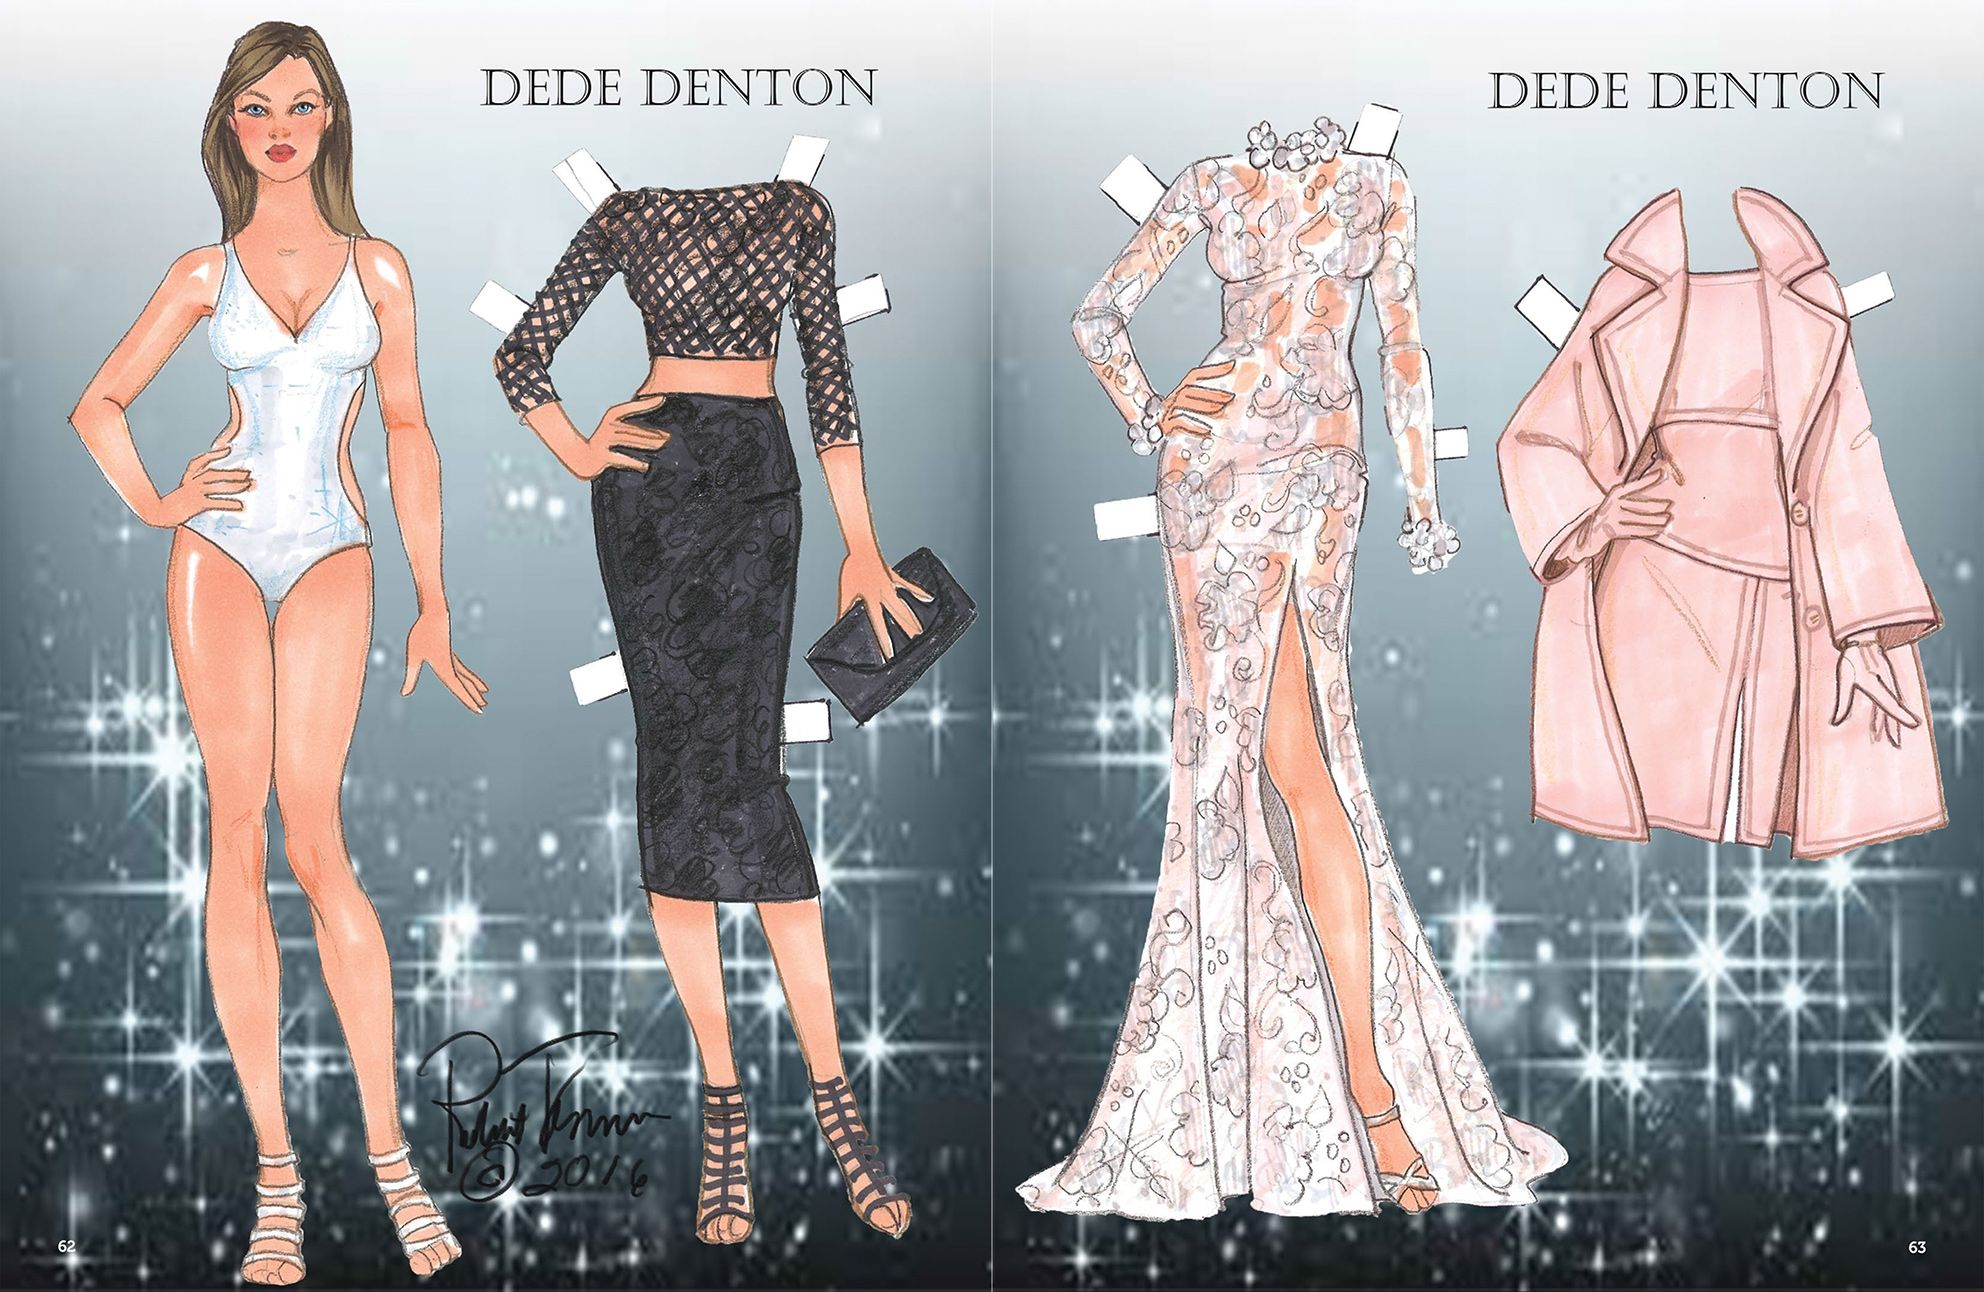 Dede Denton paper dolls